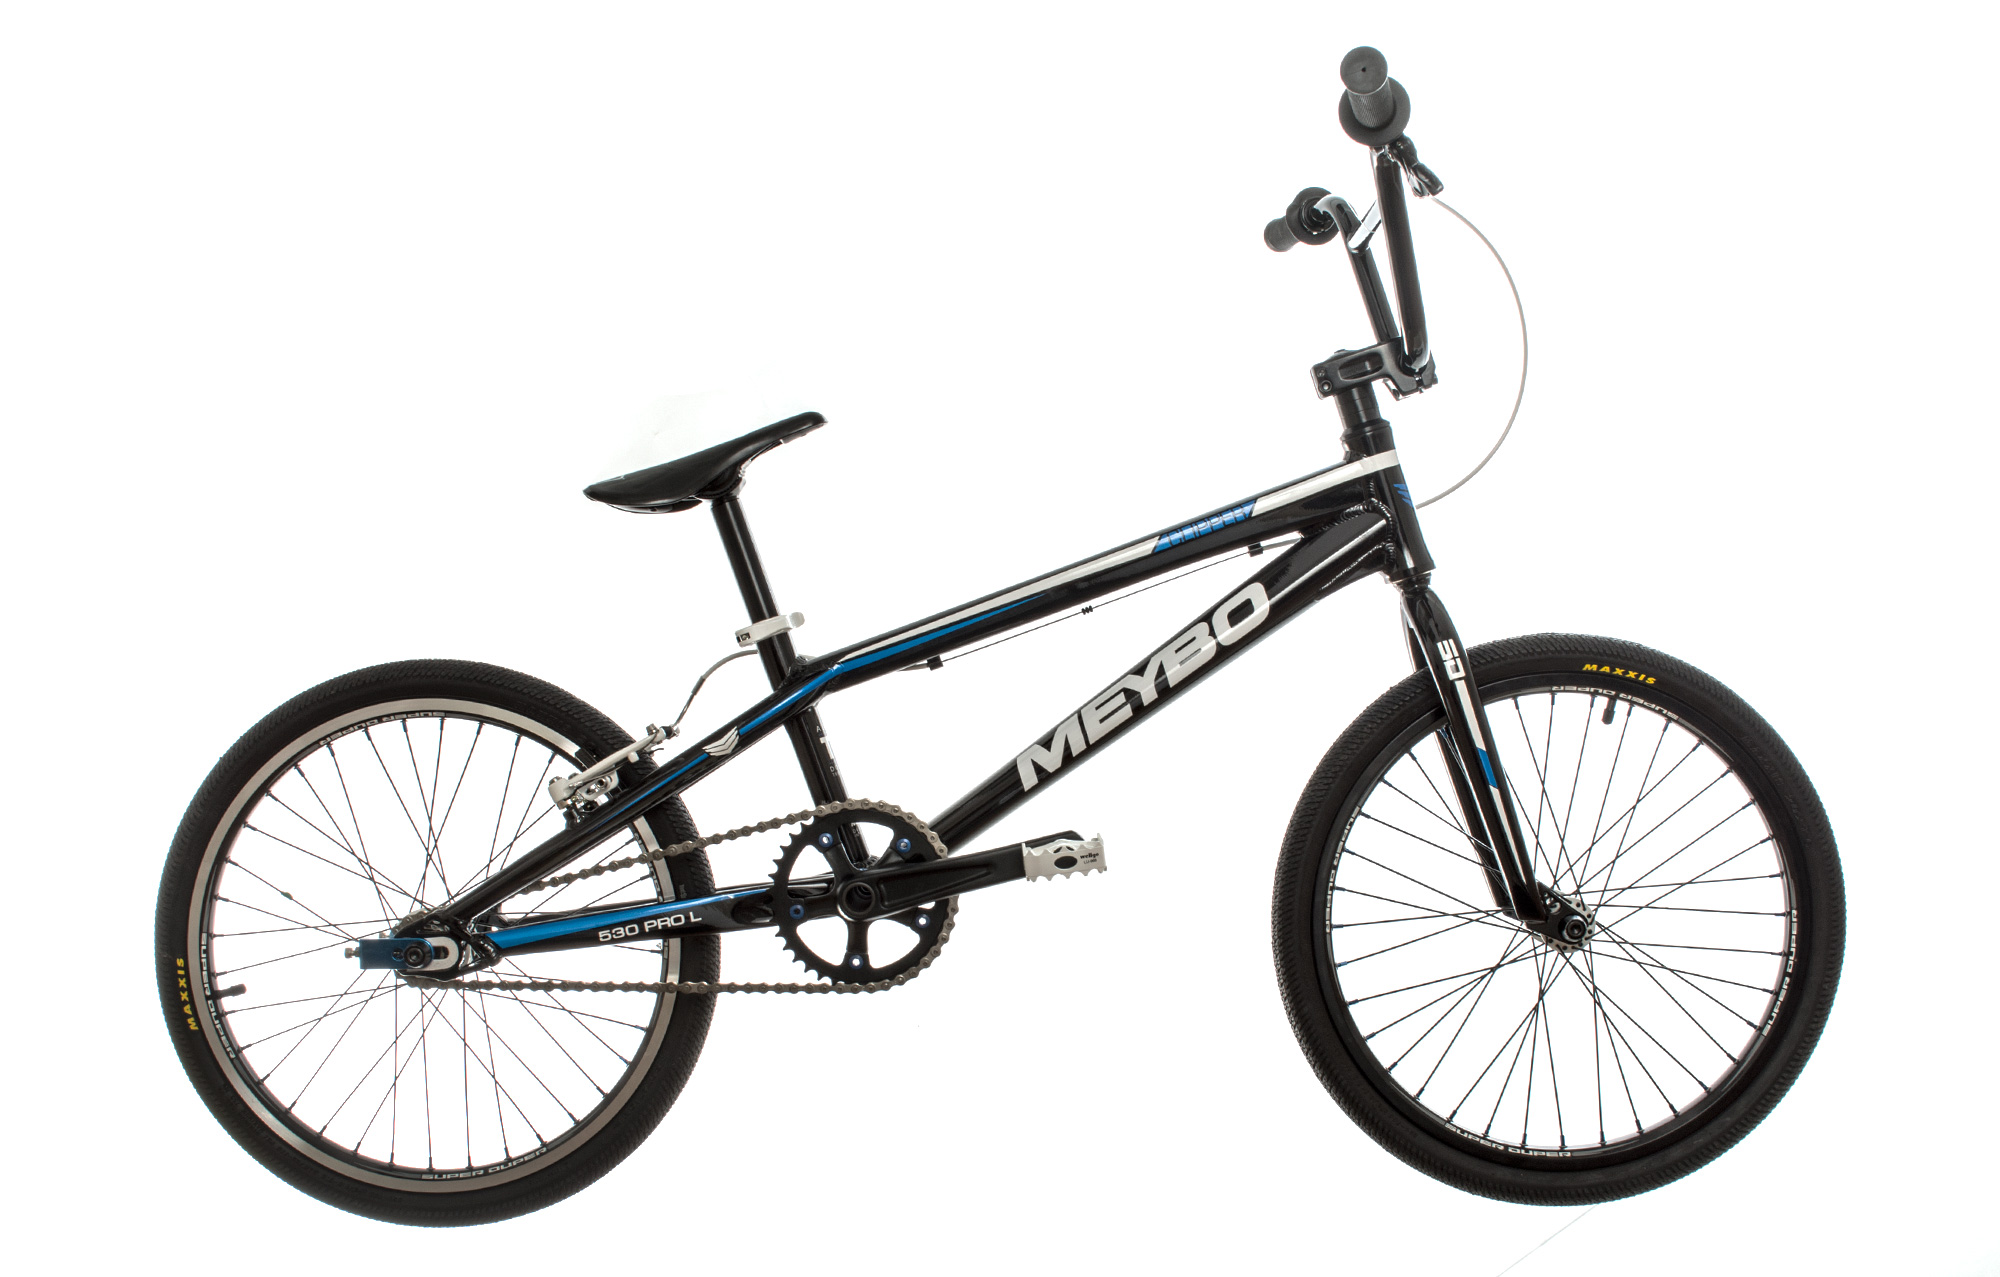 meybo clipper bmx bike pro l black. Black Bedroom Furniture Sets. Home Design Ideas